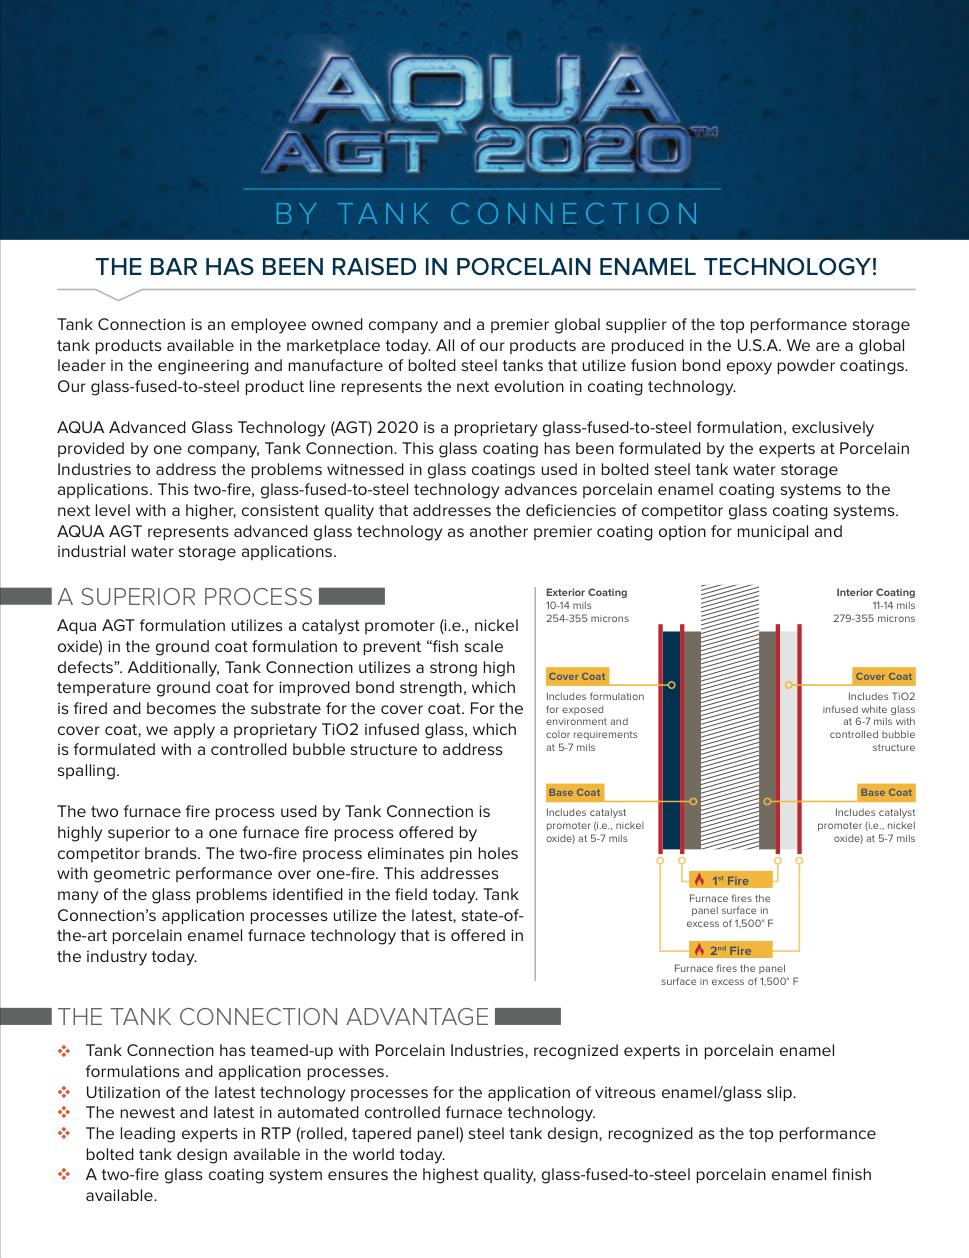 AQUA AGT 2020™ Raising the Bar